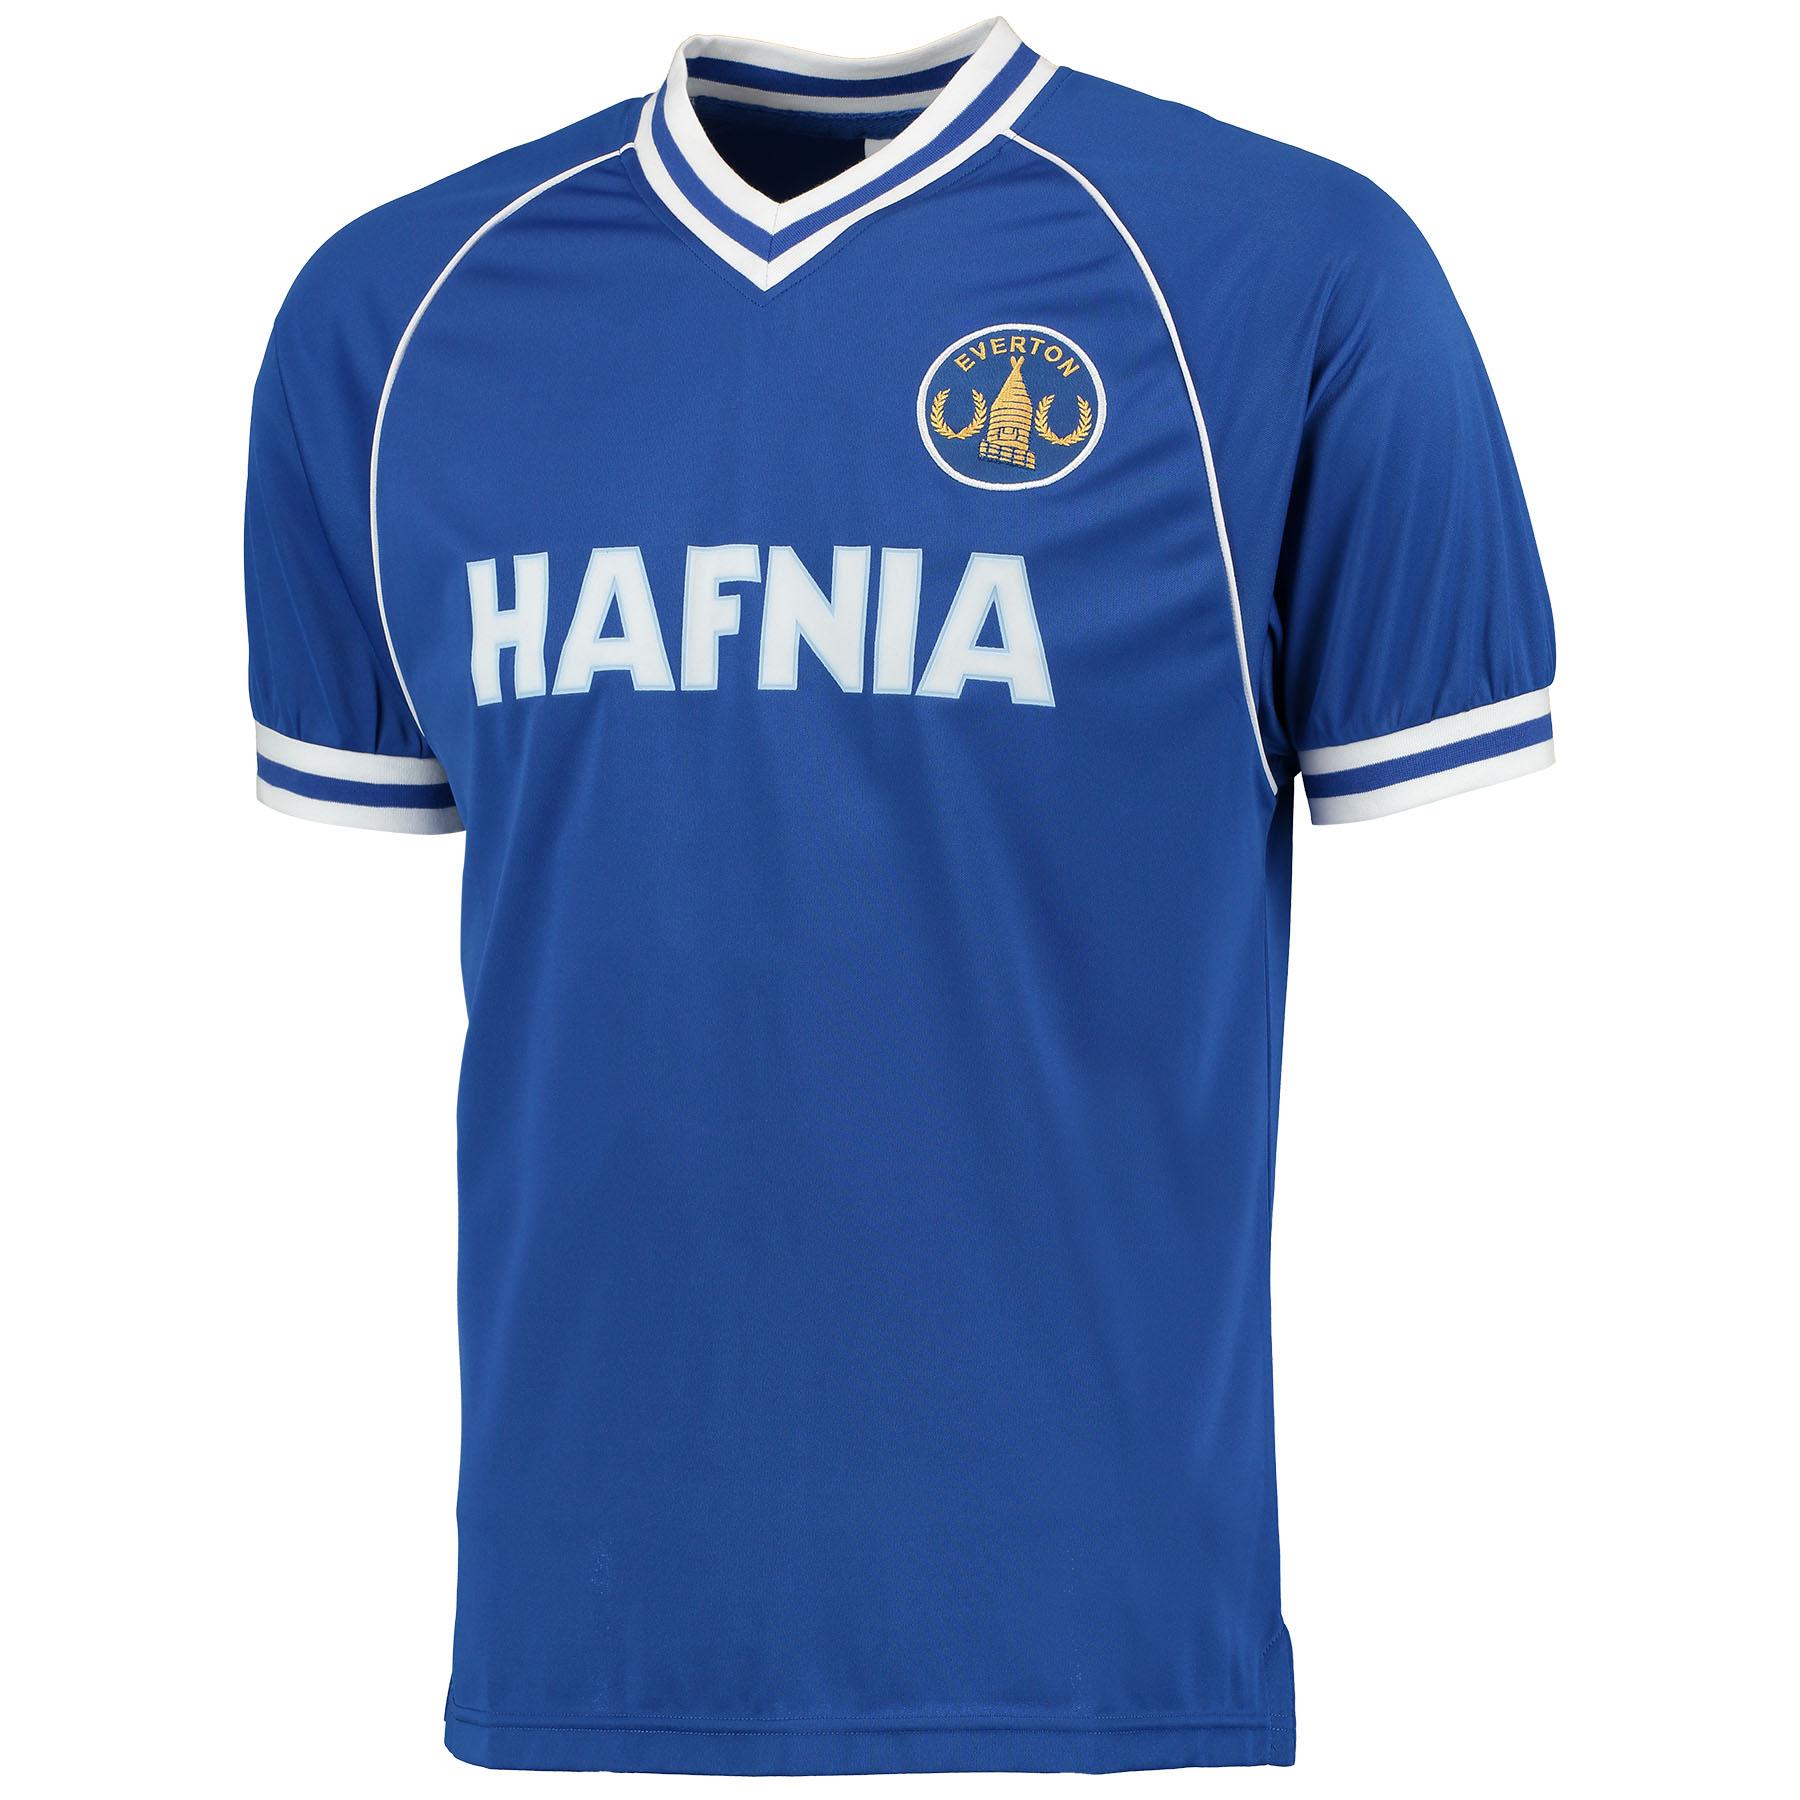 Image of Everton 1982 Home Shirt